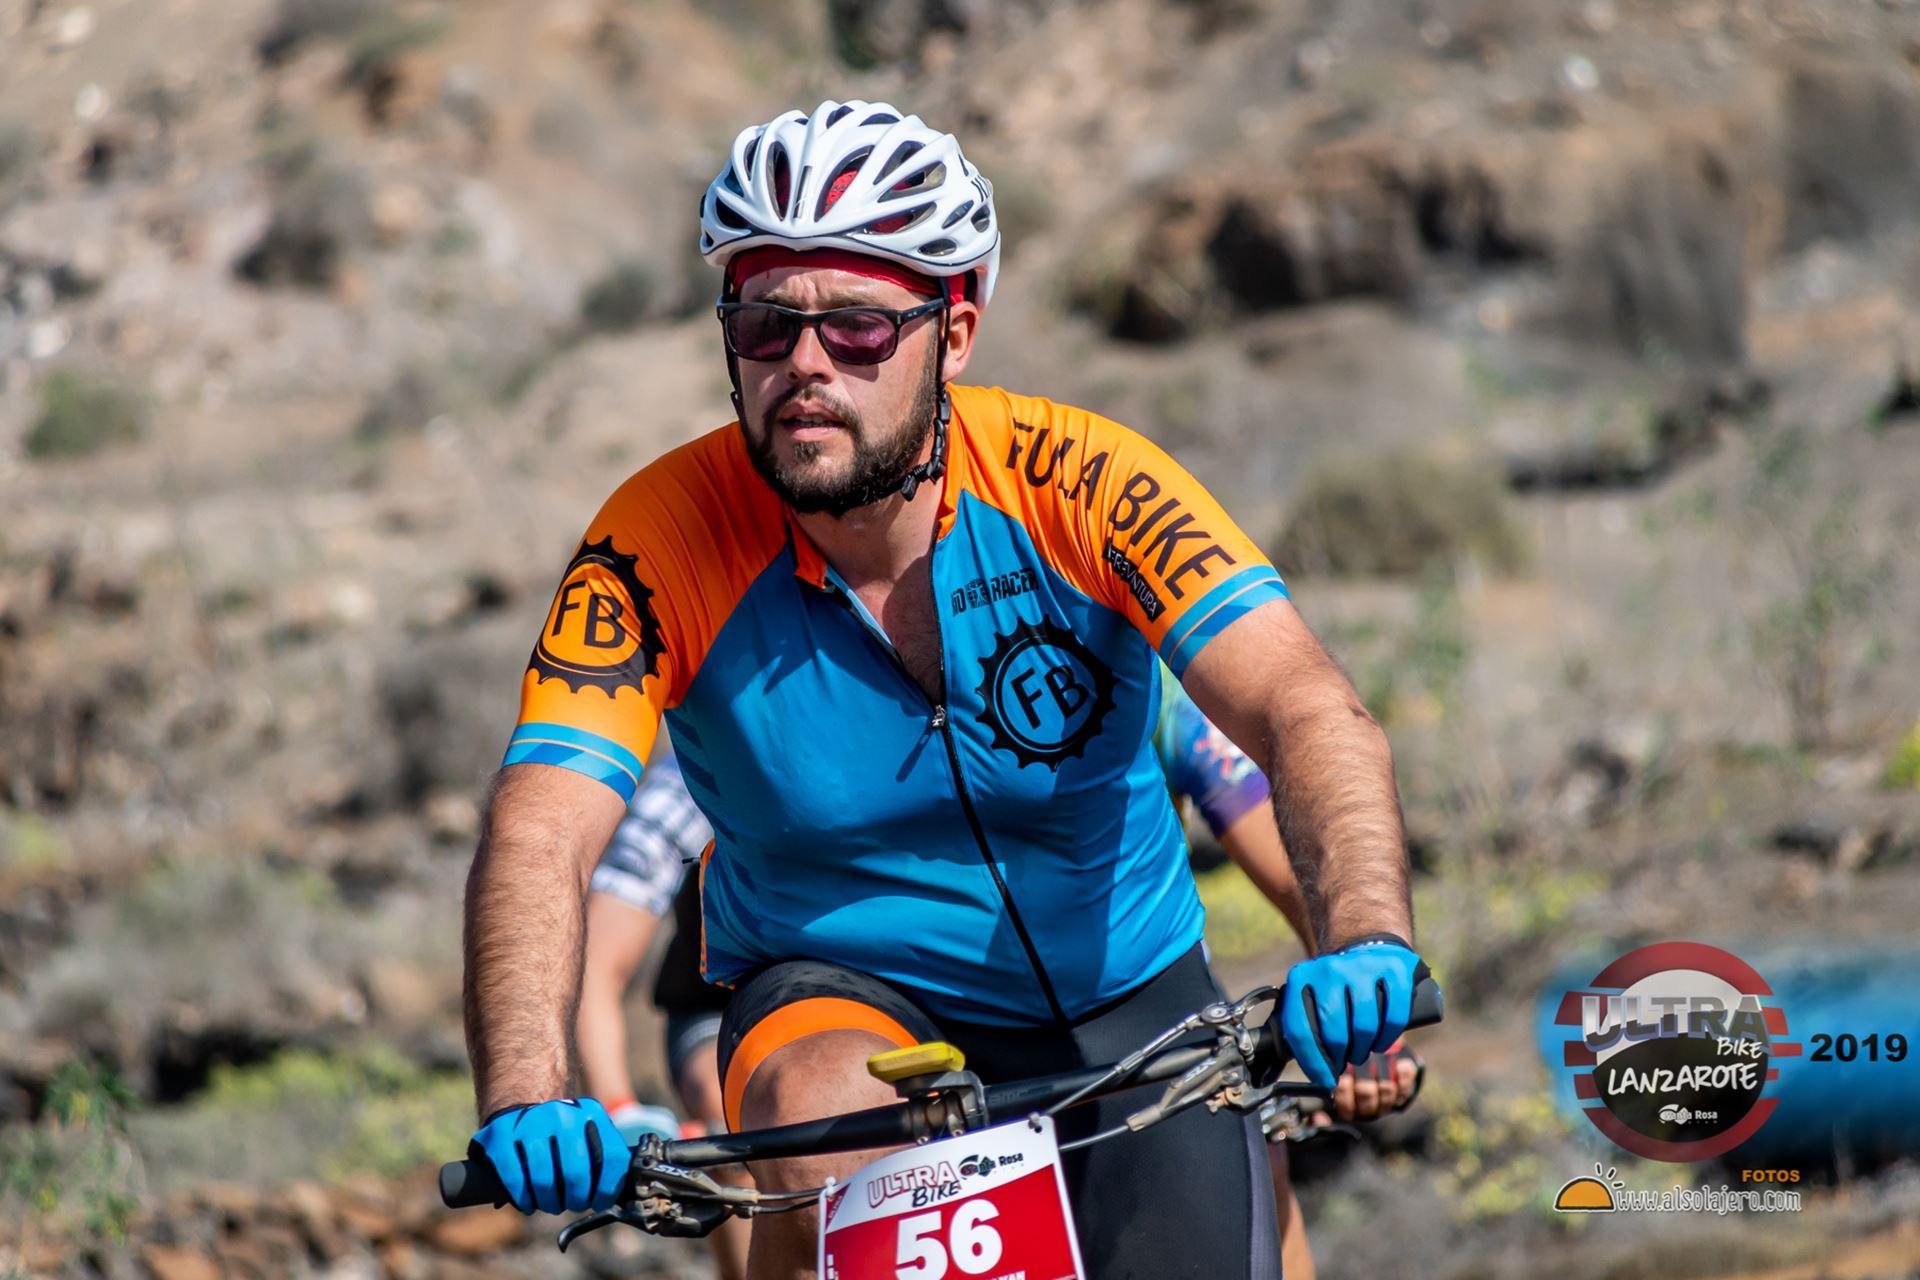 Sector Rofera 2ª Etapa Ultrabike 2019 Fotos Alsolajero.com-146